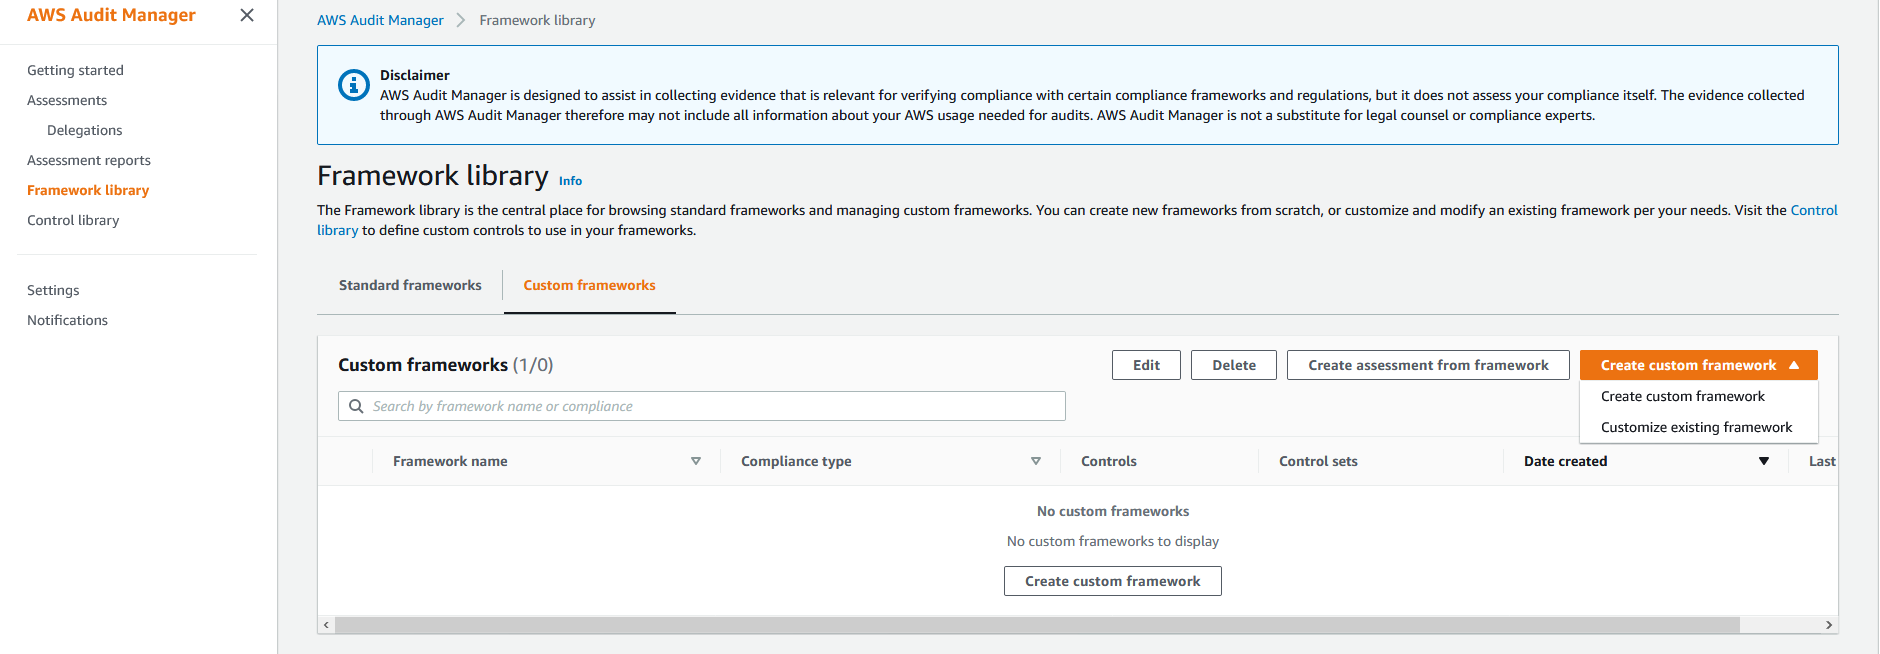 The Framework library page has tabs for Standard frameworks and Custom frameworks. The Create custom framework option is selected.